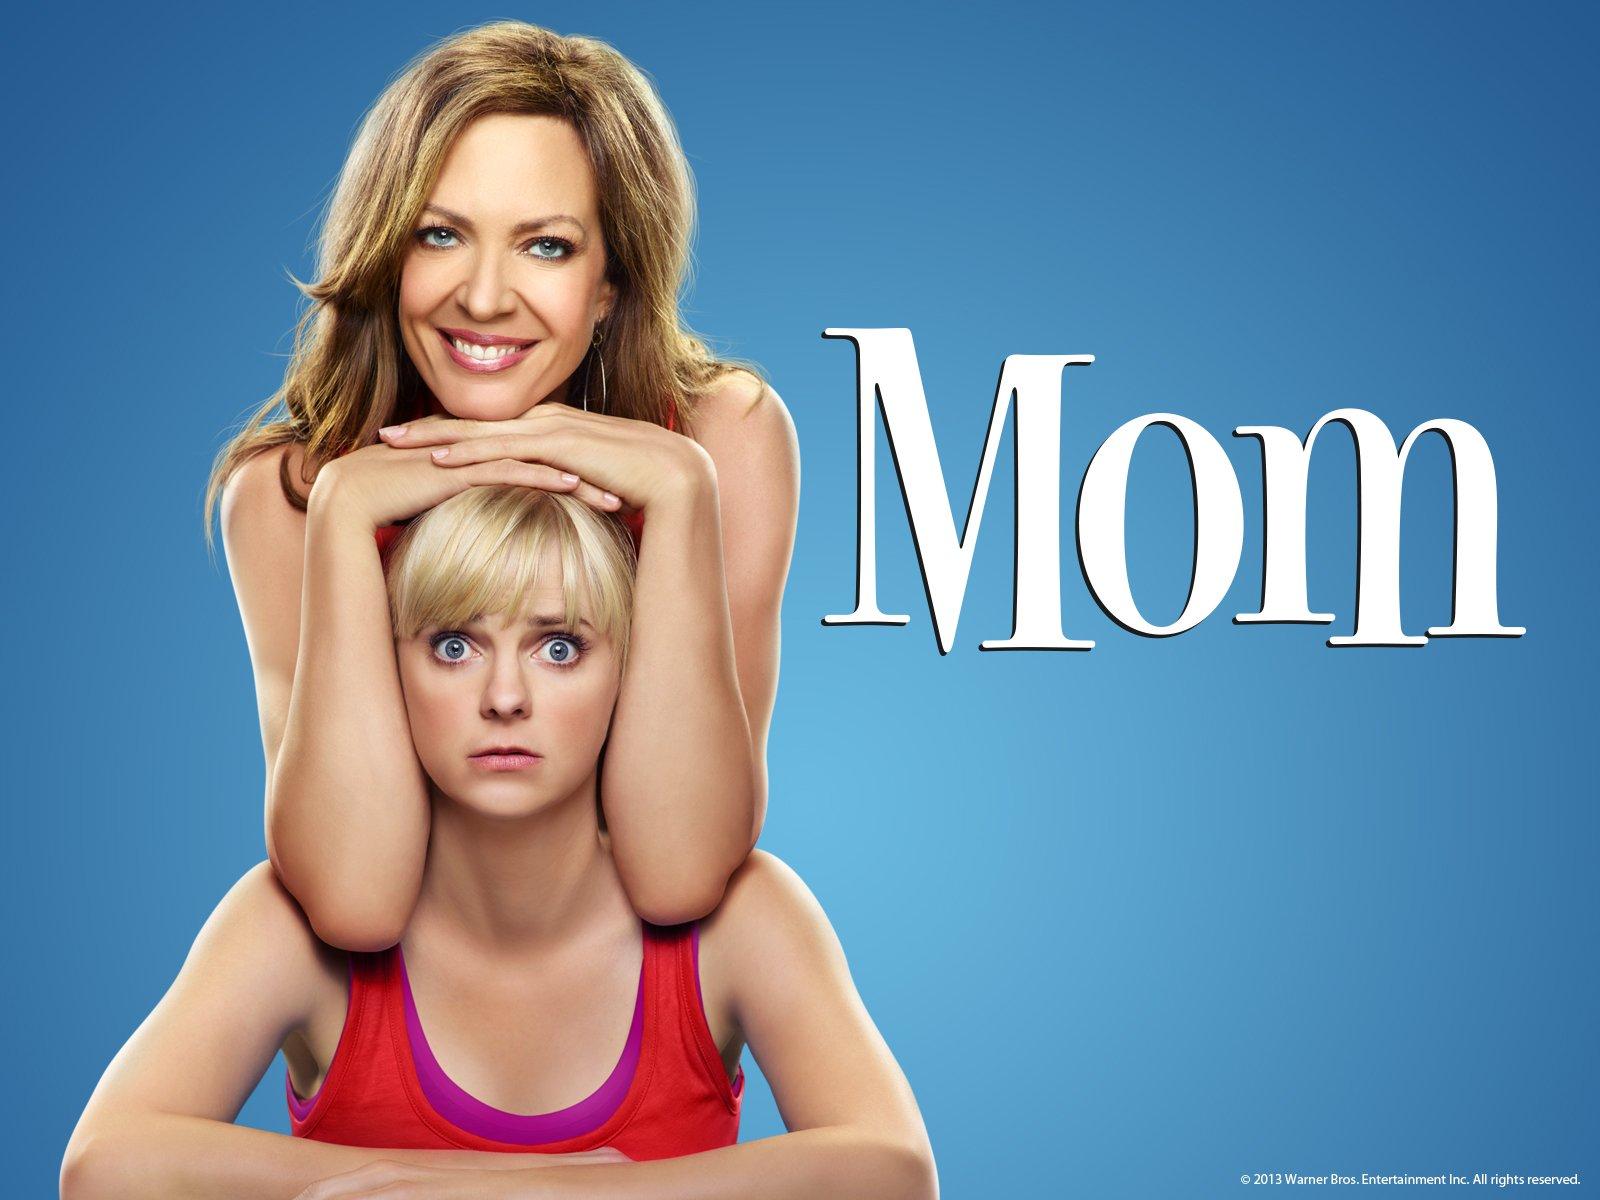 LAURA  NUBILES 71 Amazon.com: Mom: The Complete First Season: Anna Faris, Allison Janney,  Sadie Calvano, Nate Corddry, Matt Jones, French Stewart, Mimi Kennedy, ...